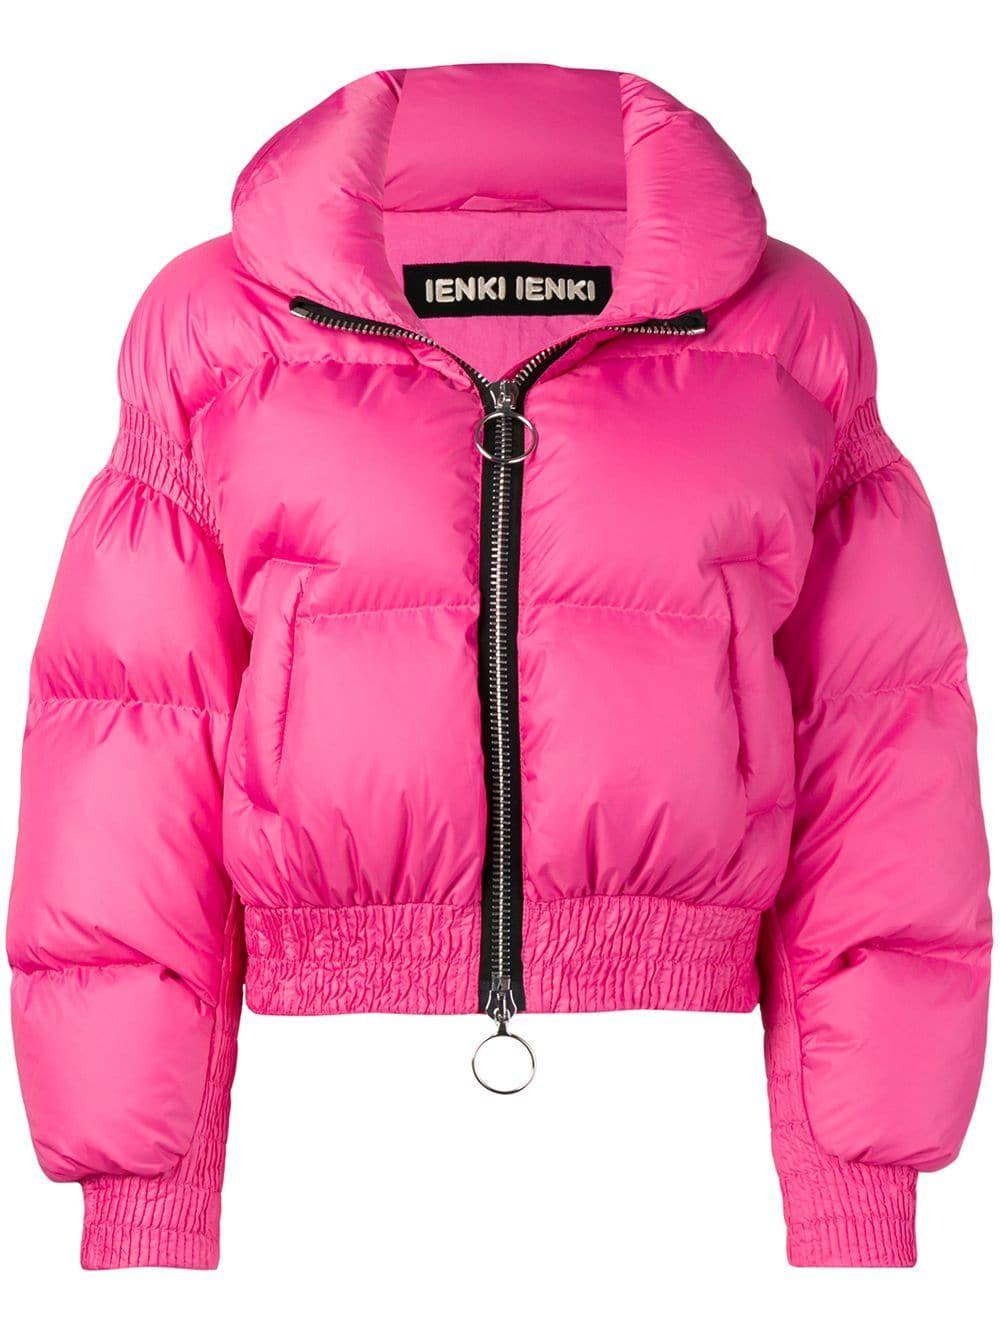 Ienki Ienki Ienki Ienki Cropped Puffer Jacket Pink Ienkiienki Cloth [ 1334 x 1000 Pixel ]